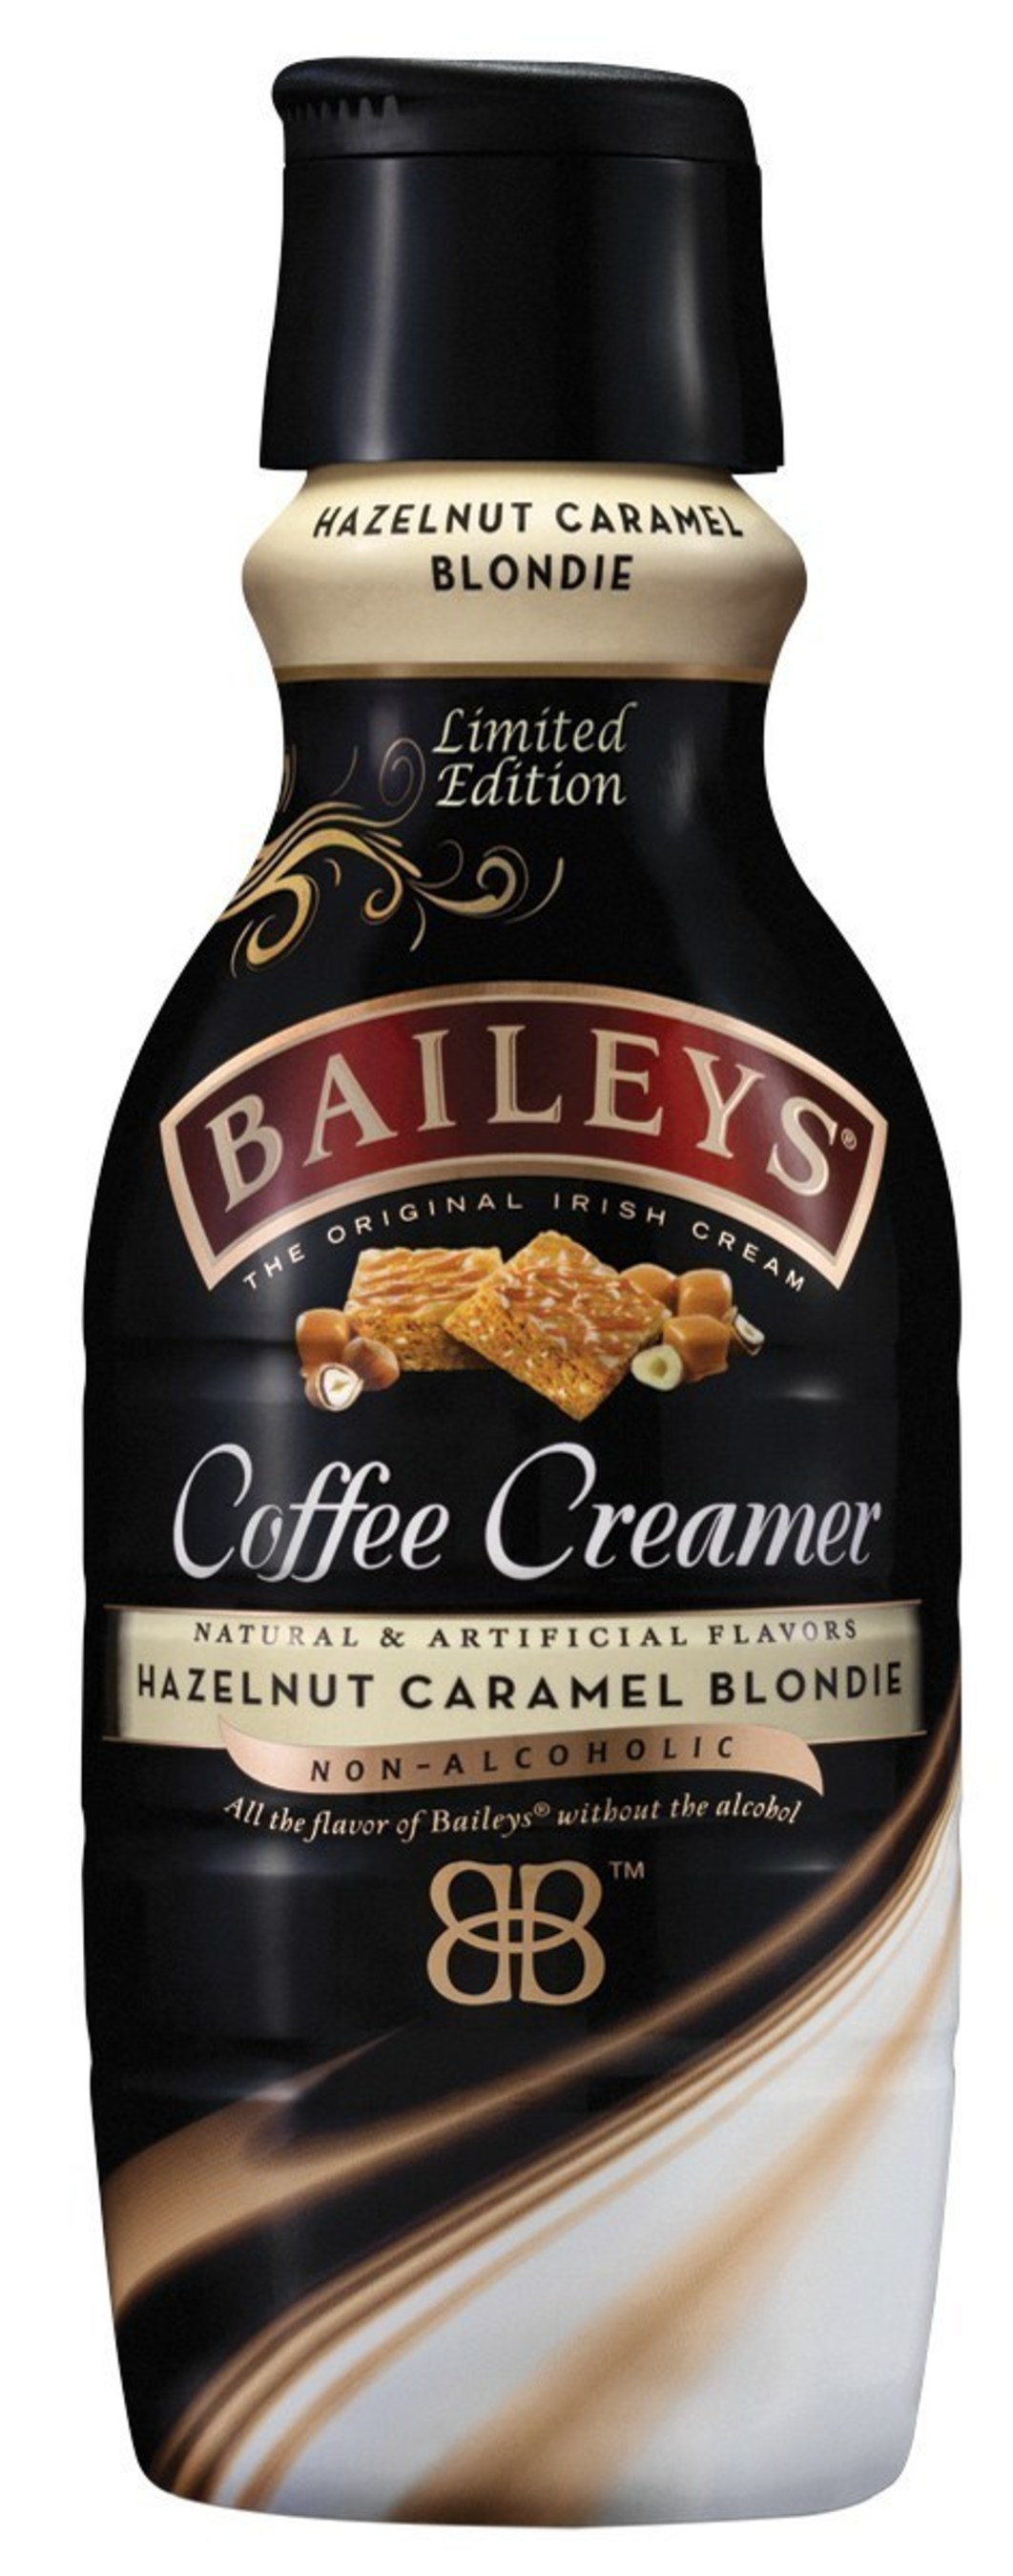 BAILEYS Coffee Creamer Hazelnut Caramel Blondie